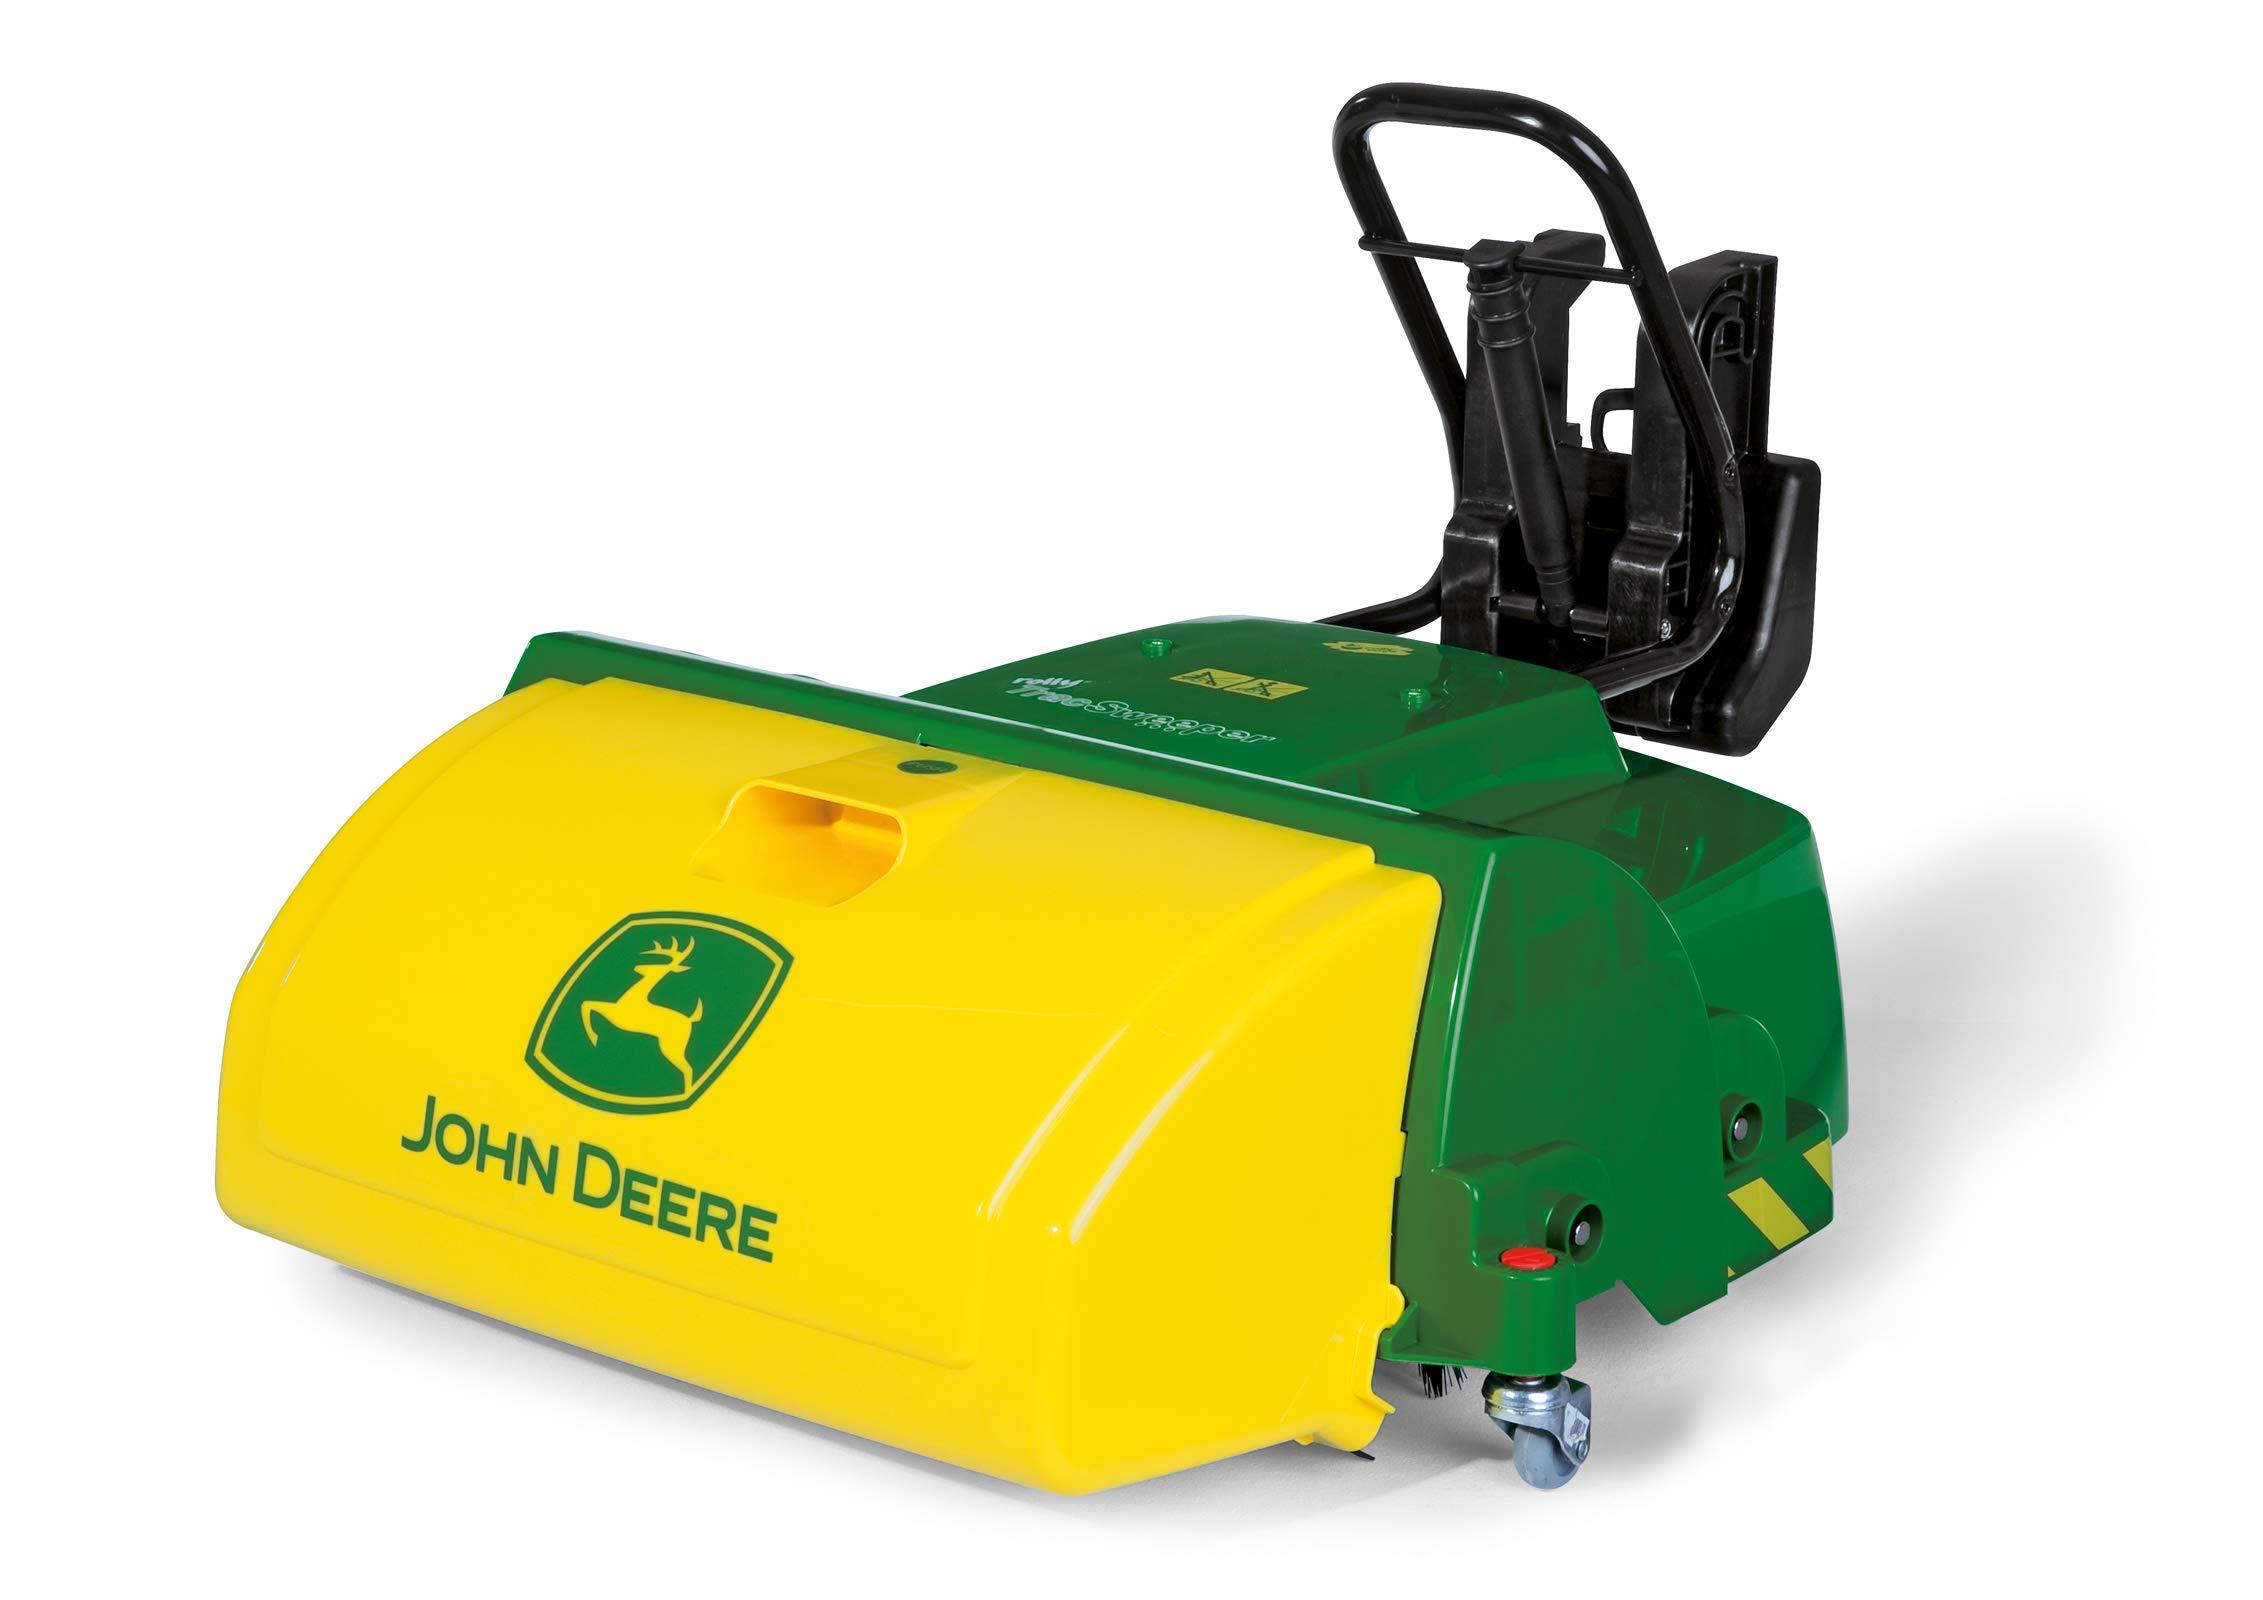 rolly toys 409716 Franz Cutter John Deere Road Sweeper